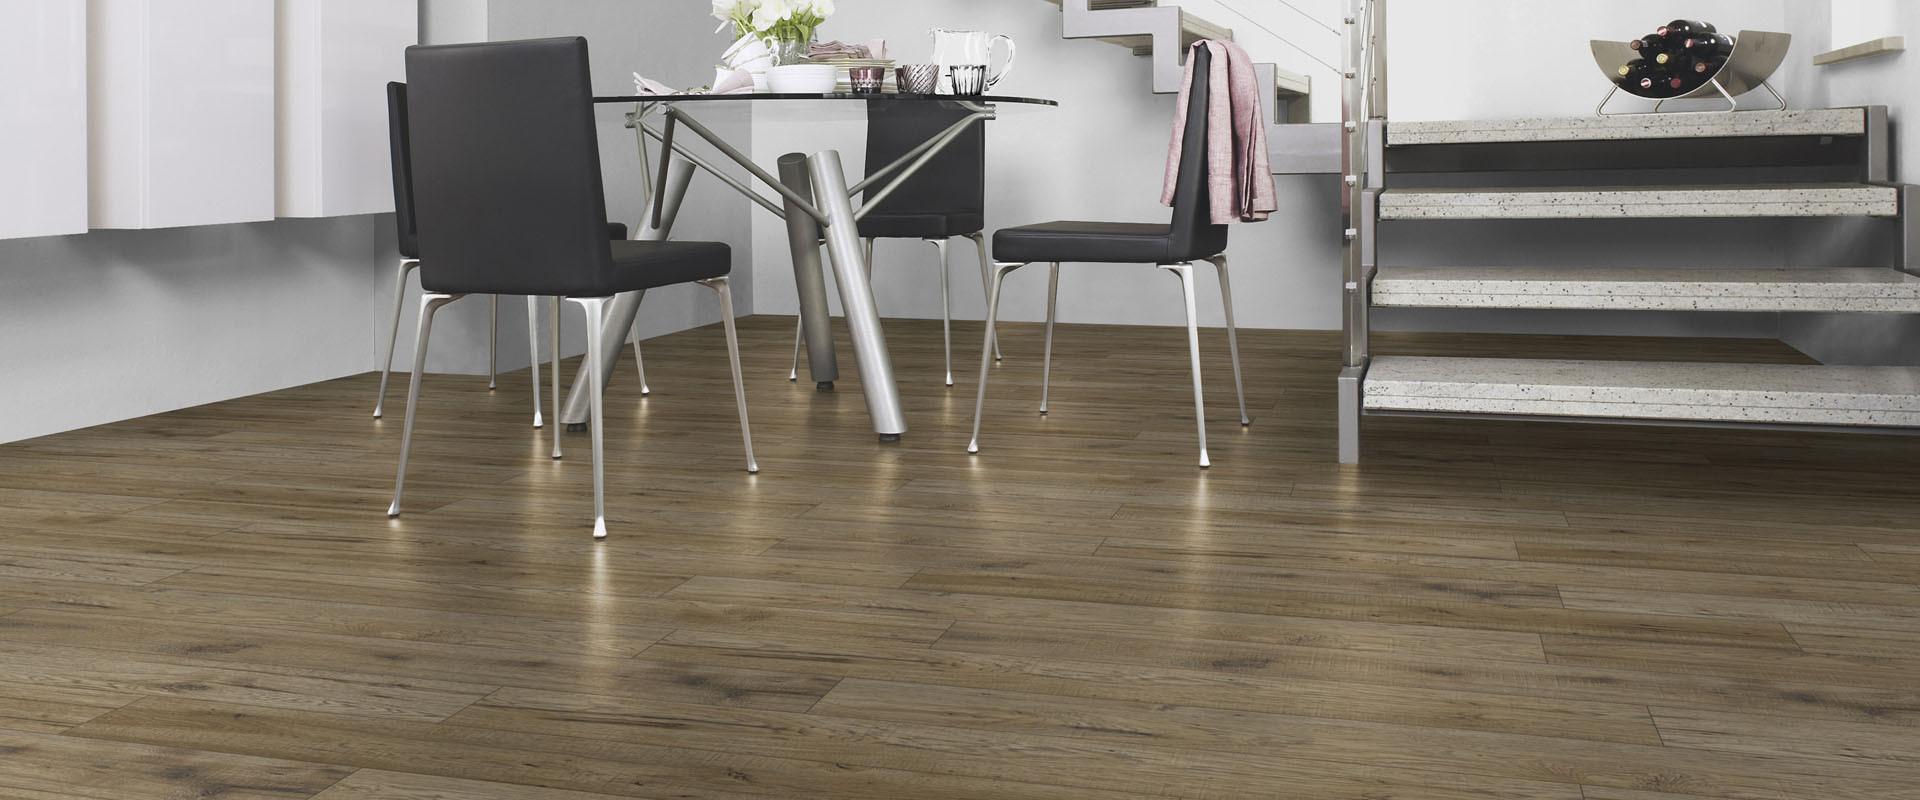 hardwood flooring newcastle upon tyne of understanding wood for newcastle gateshead karpet mills pertaining to karpet mills laminate